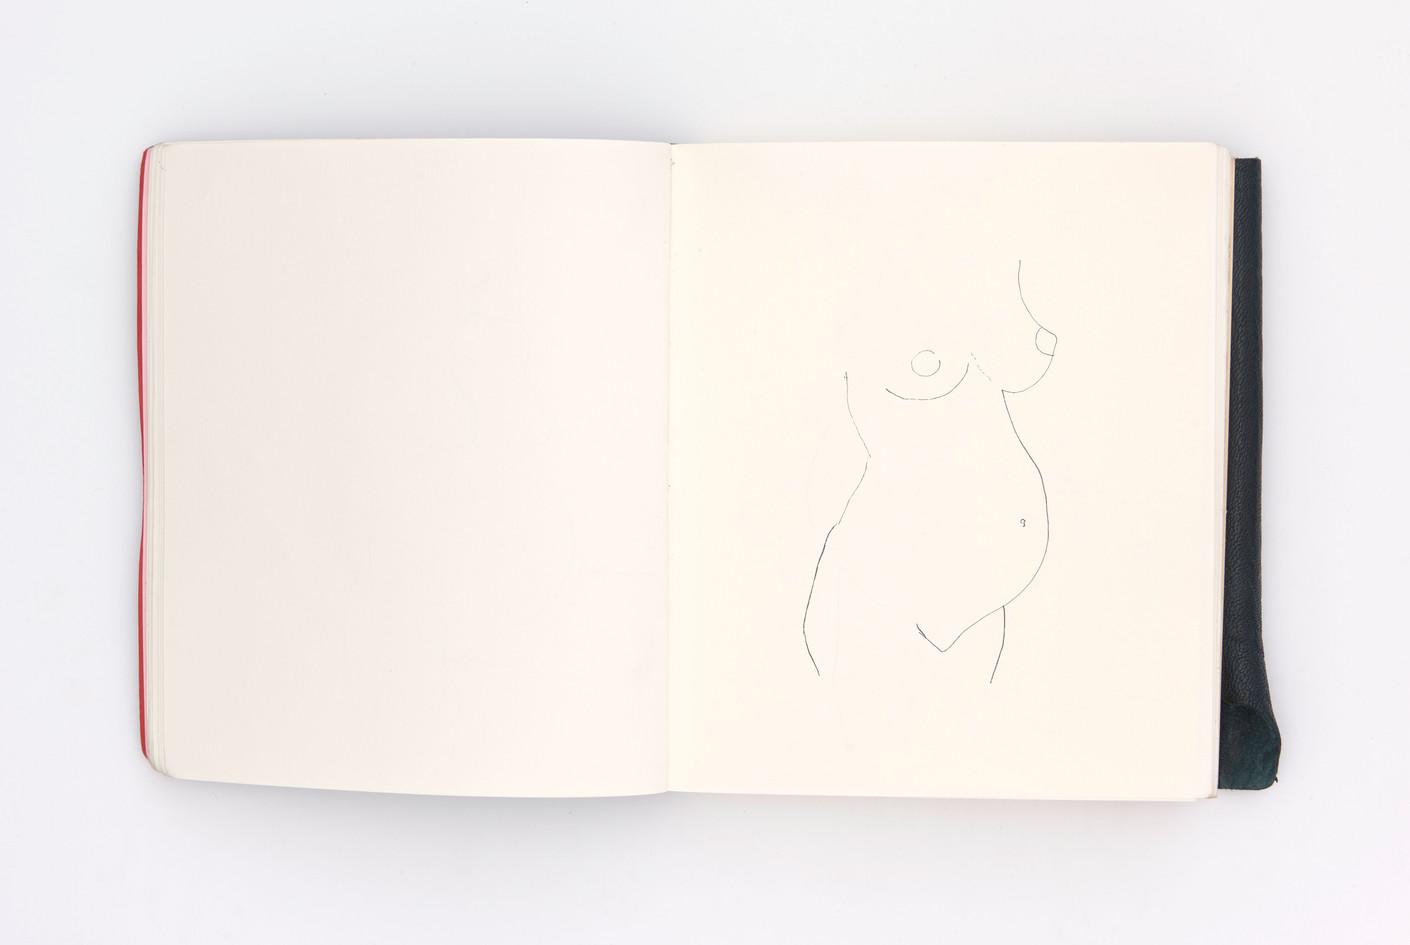 LargerBook-012.jpg